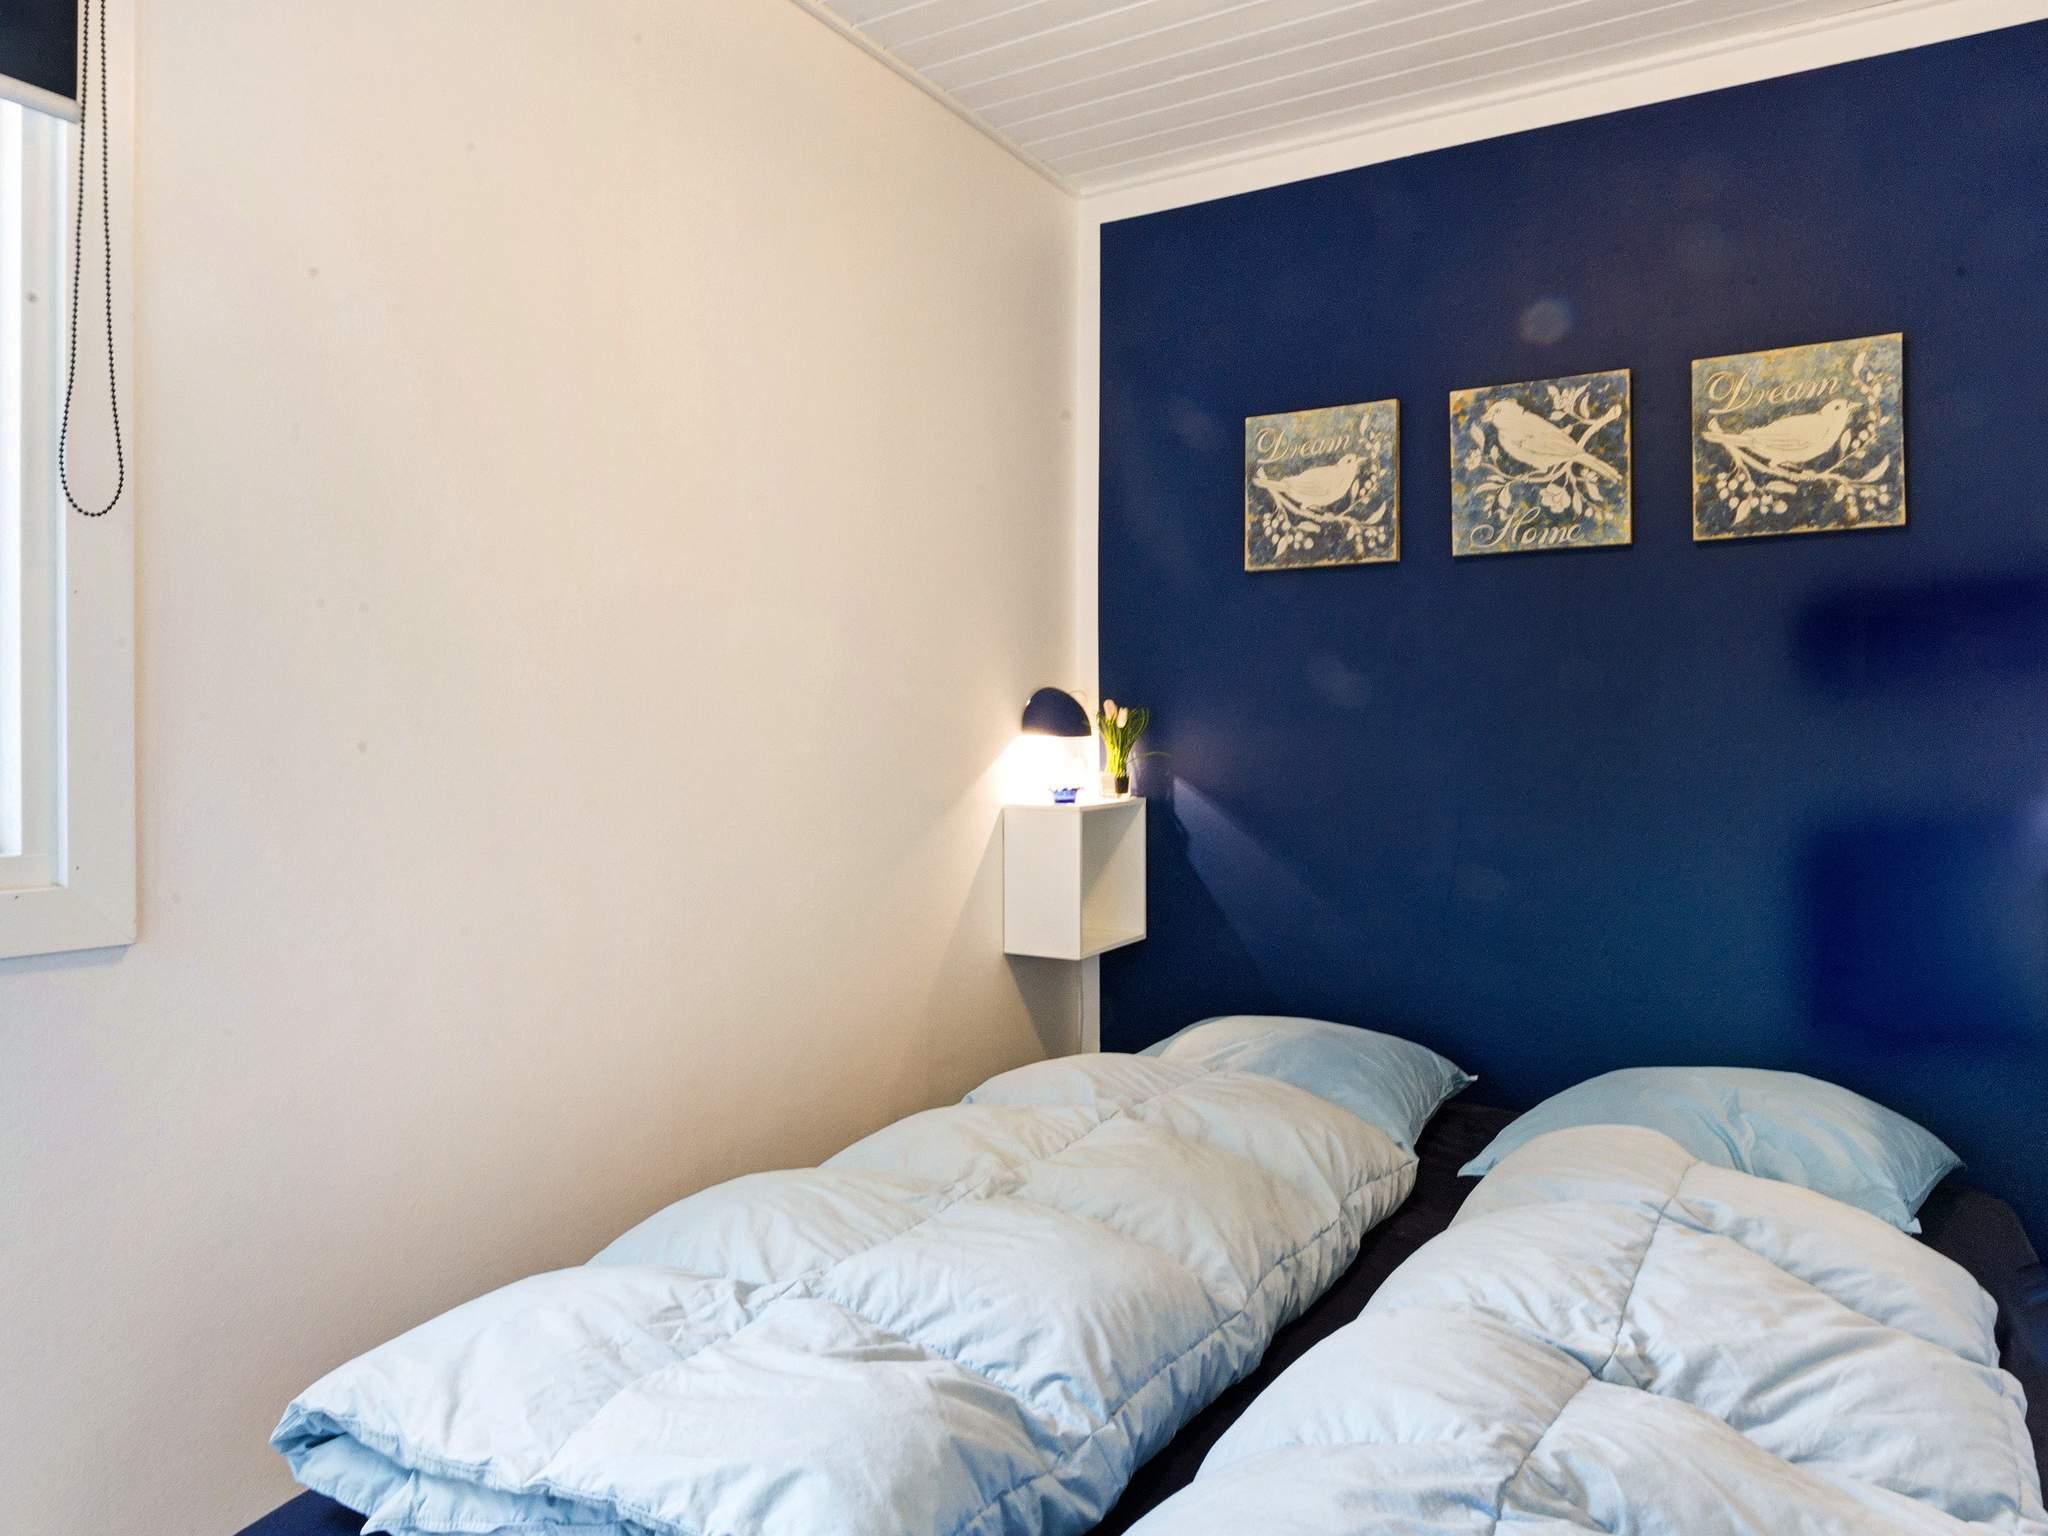 Ferienhaus Hasle (89205), Hasle, , Bornholm, Dänemark, Bild 11